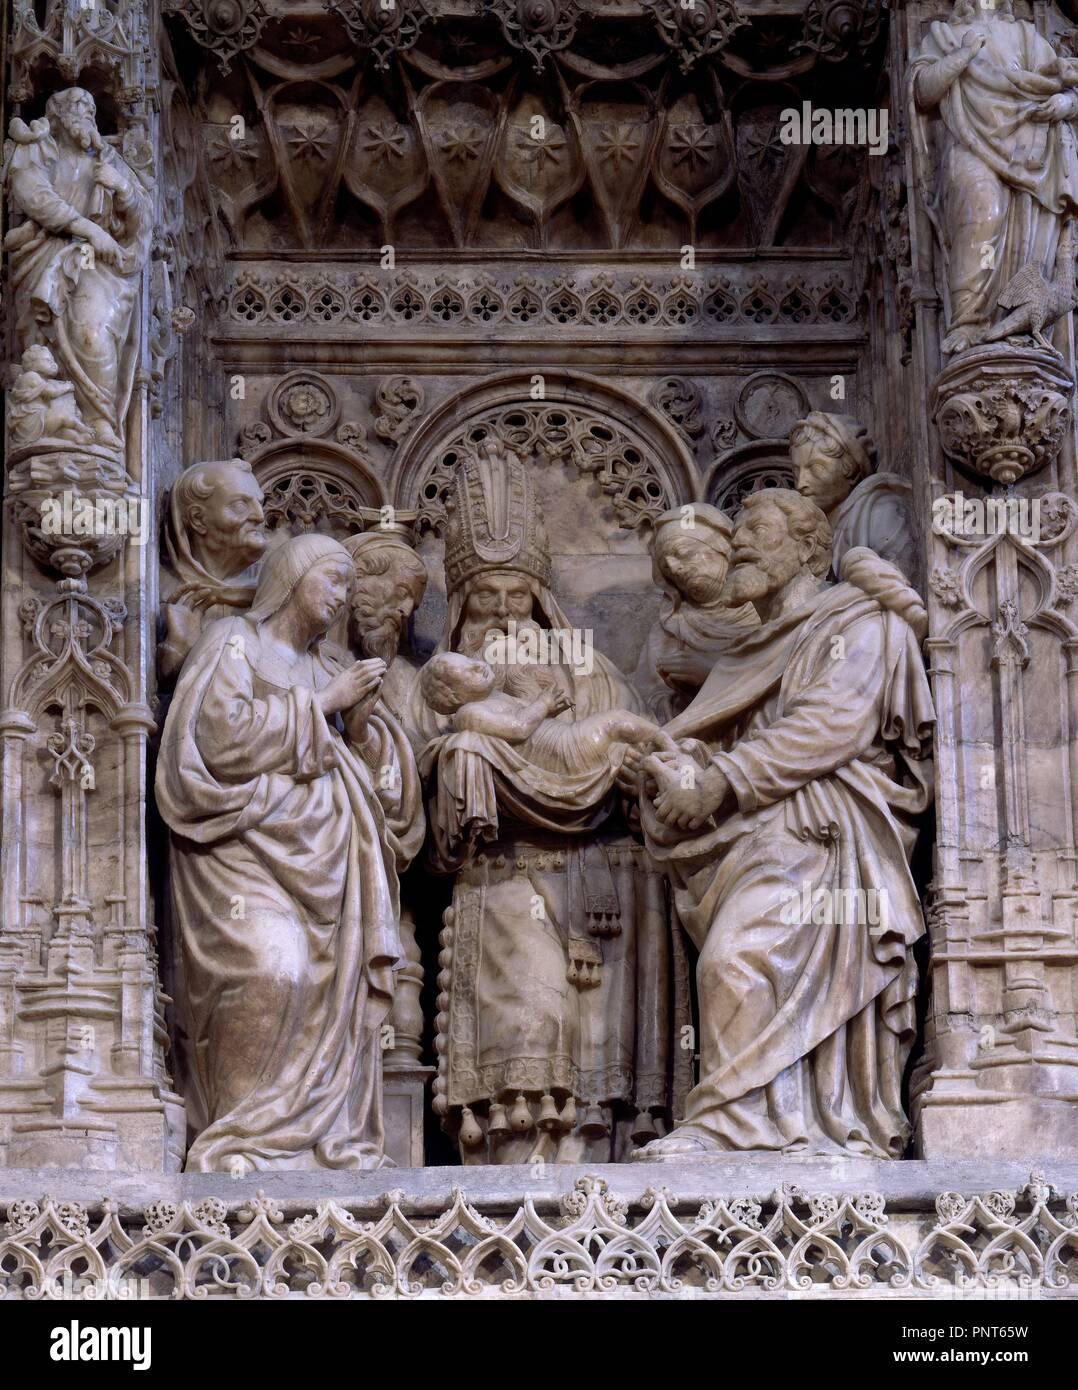 INTERIOR-RETABLO MAYOR-1509-DET CIRCUNCISION. Author: FORMENT DAMIAN.  Location: BASILICA DEL PILAR. SARAGOSSA. Saragossa Zaragoza. SPAIN.